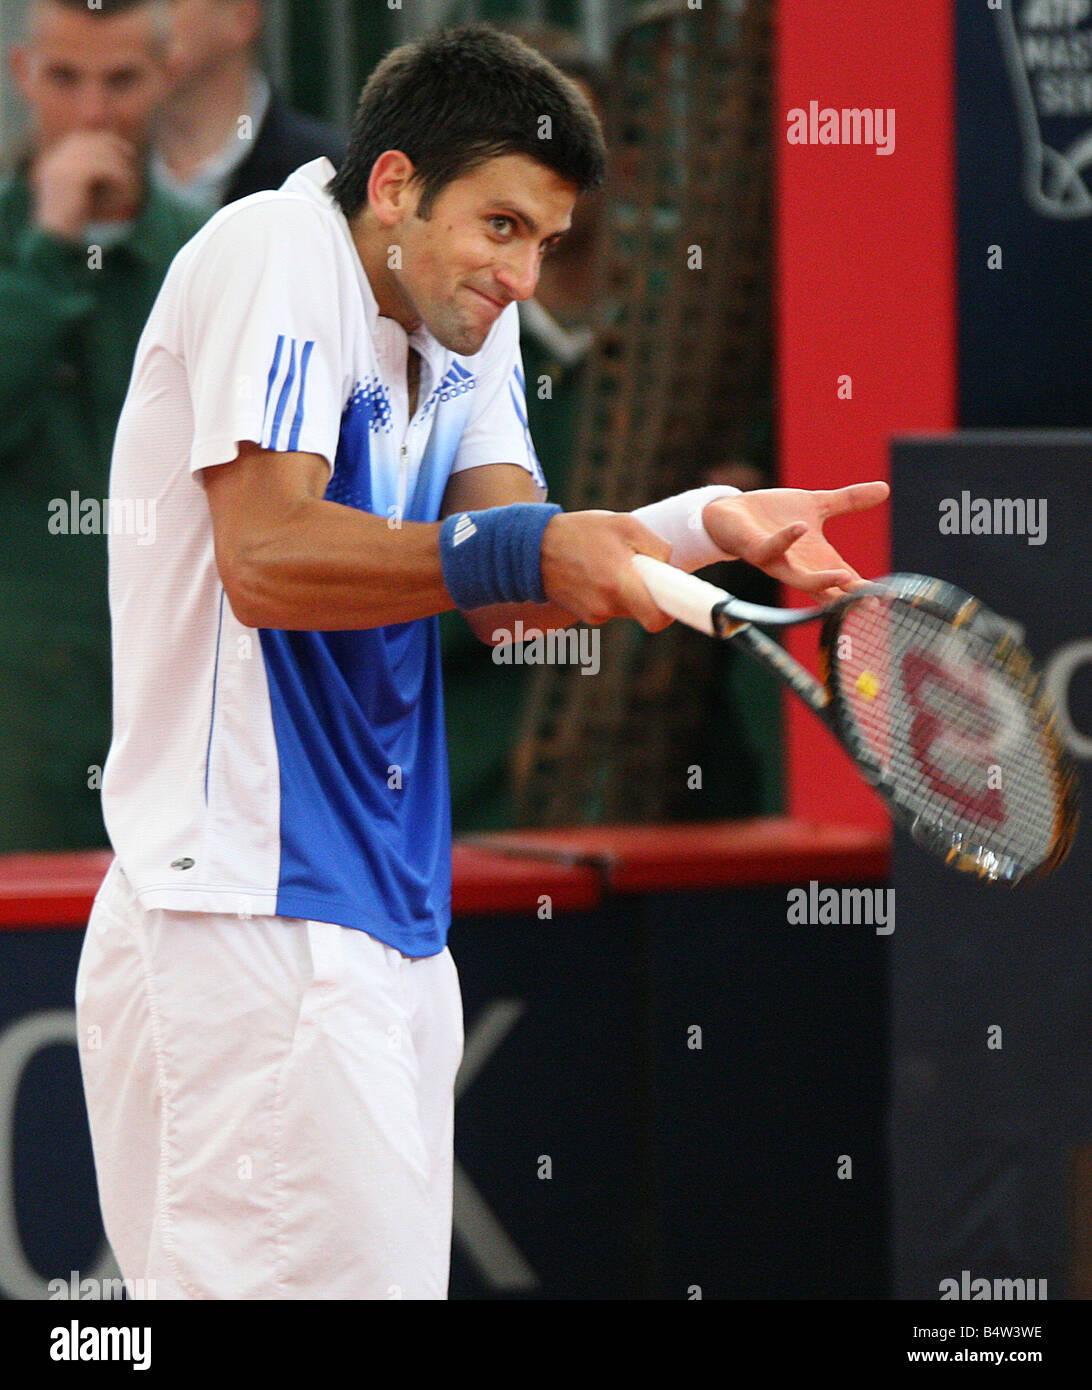 Novak Djoković from Belgrade, Serbia, Would Number 3 tennis player - Stock Image